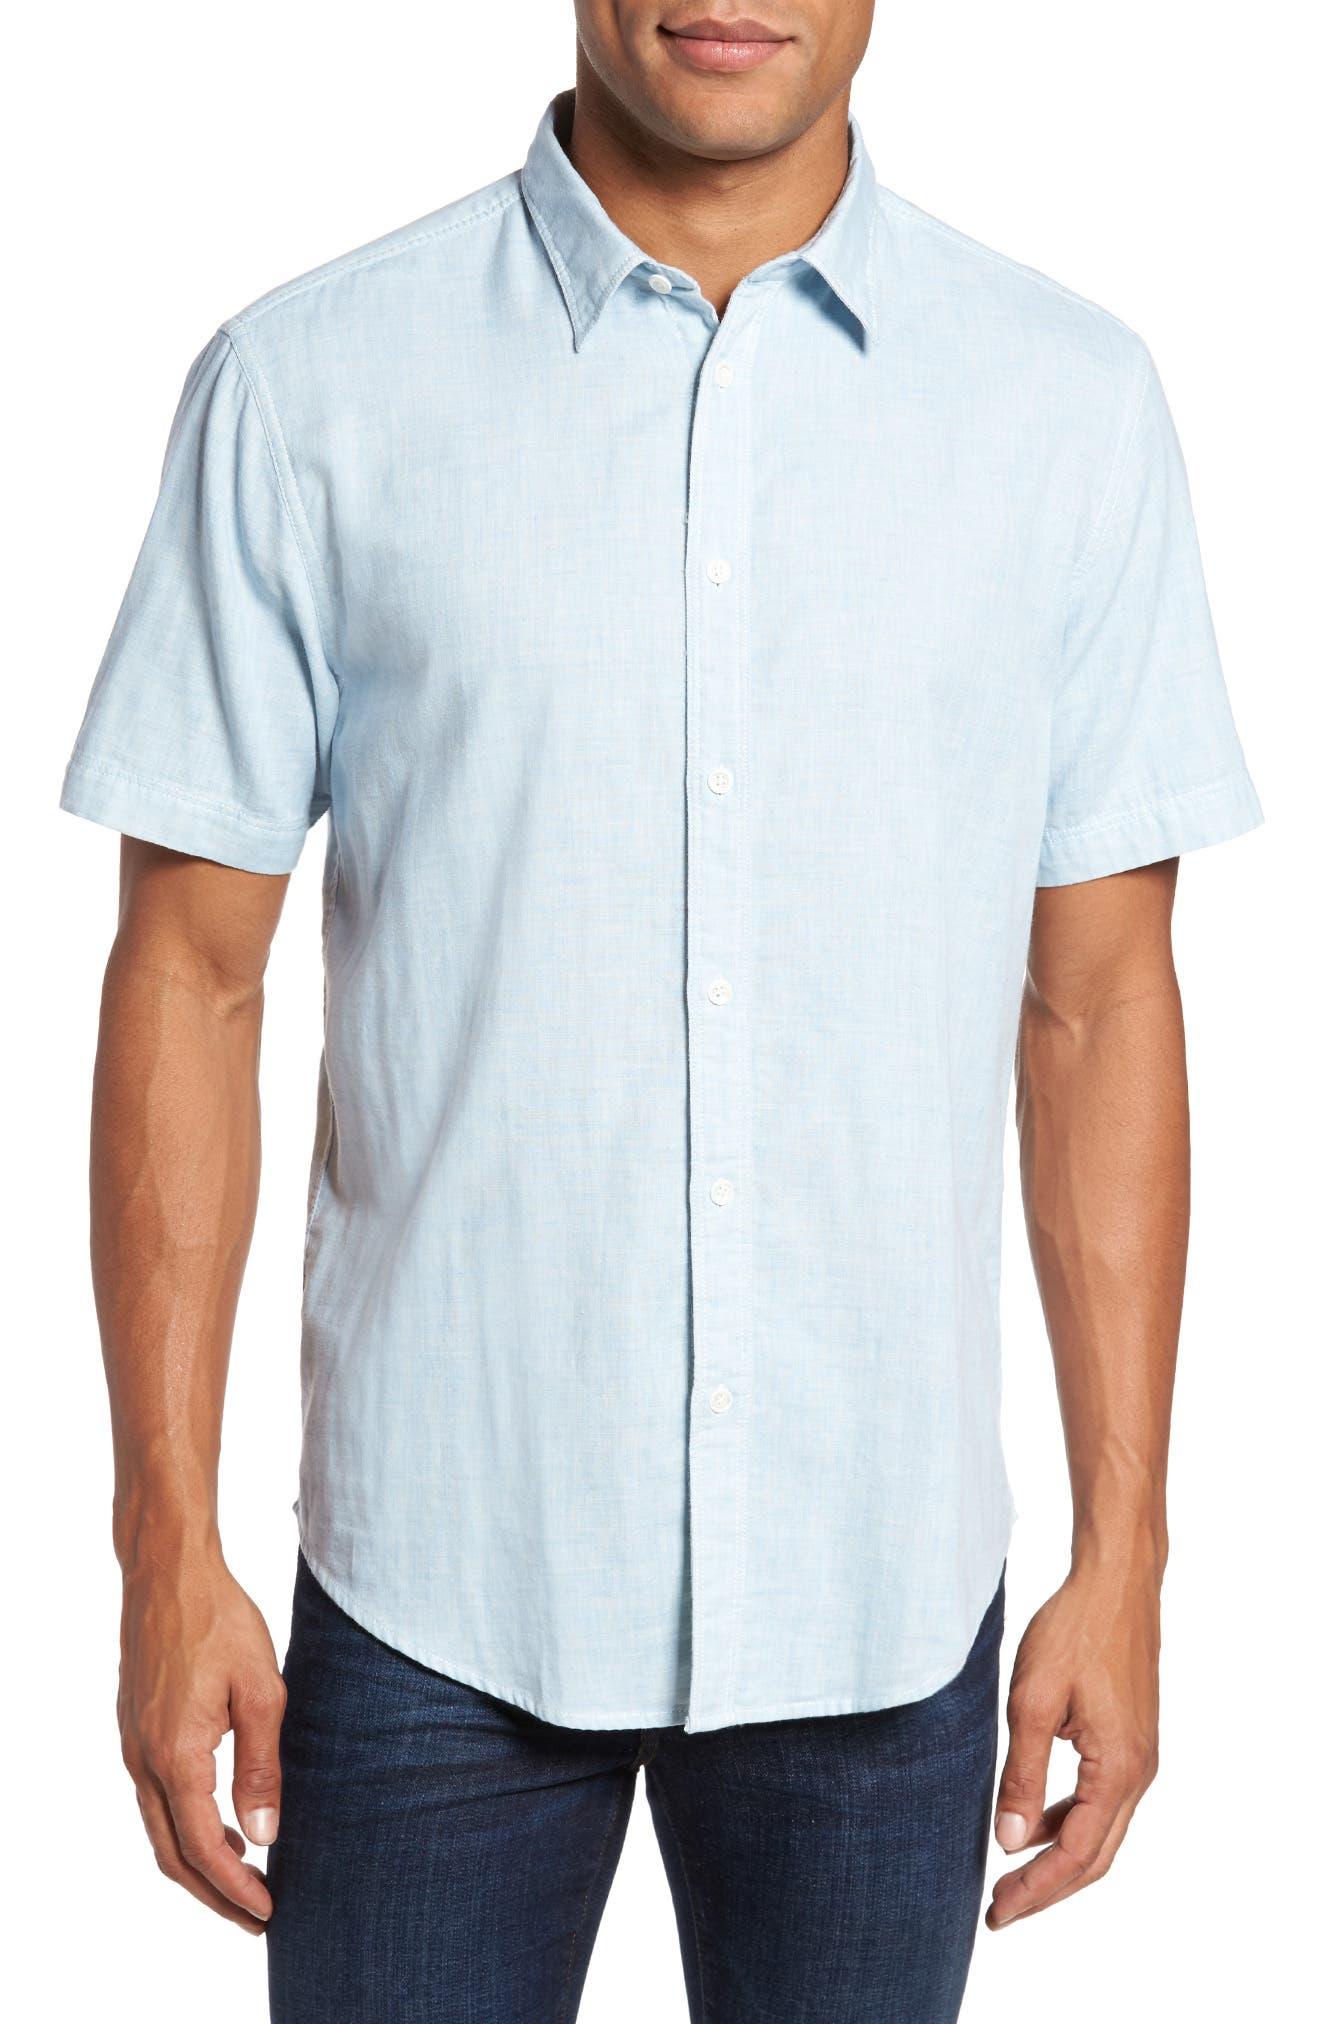 Coastaoro Encinitas Regular Fit Sport Shirt